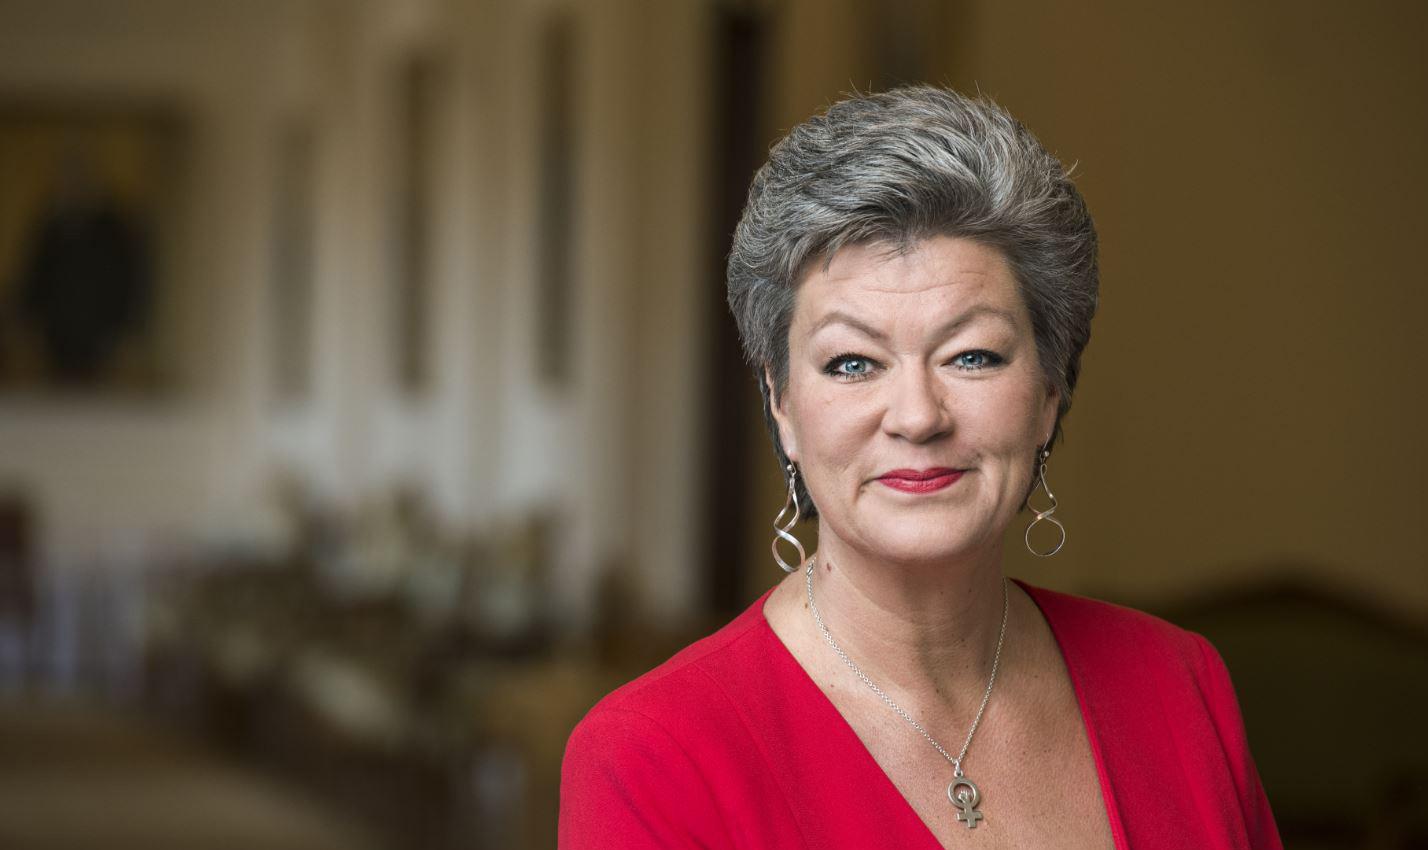 Ylva Johansson: Minister for Employment with a feminist agenda